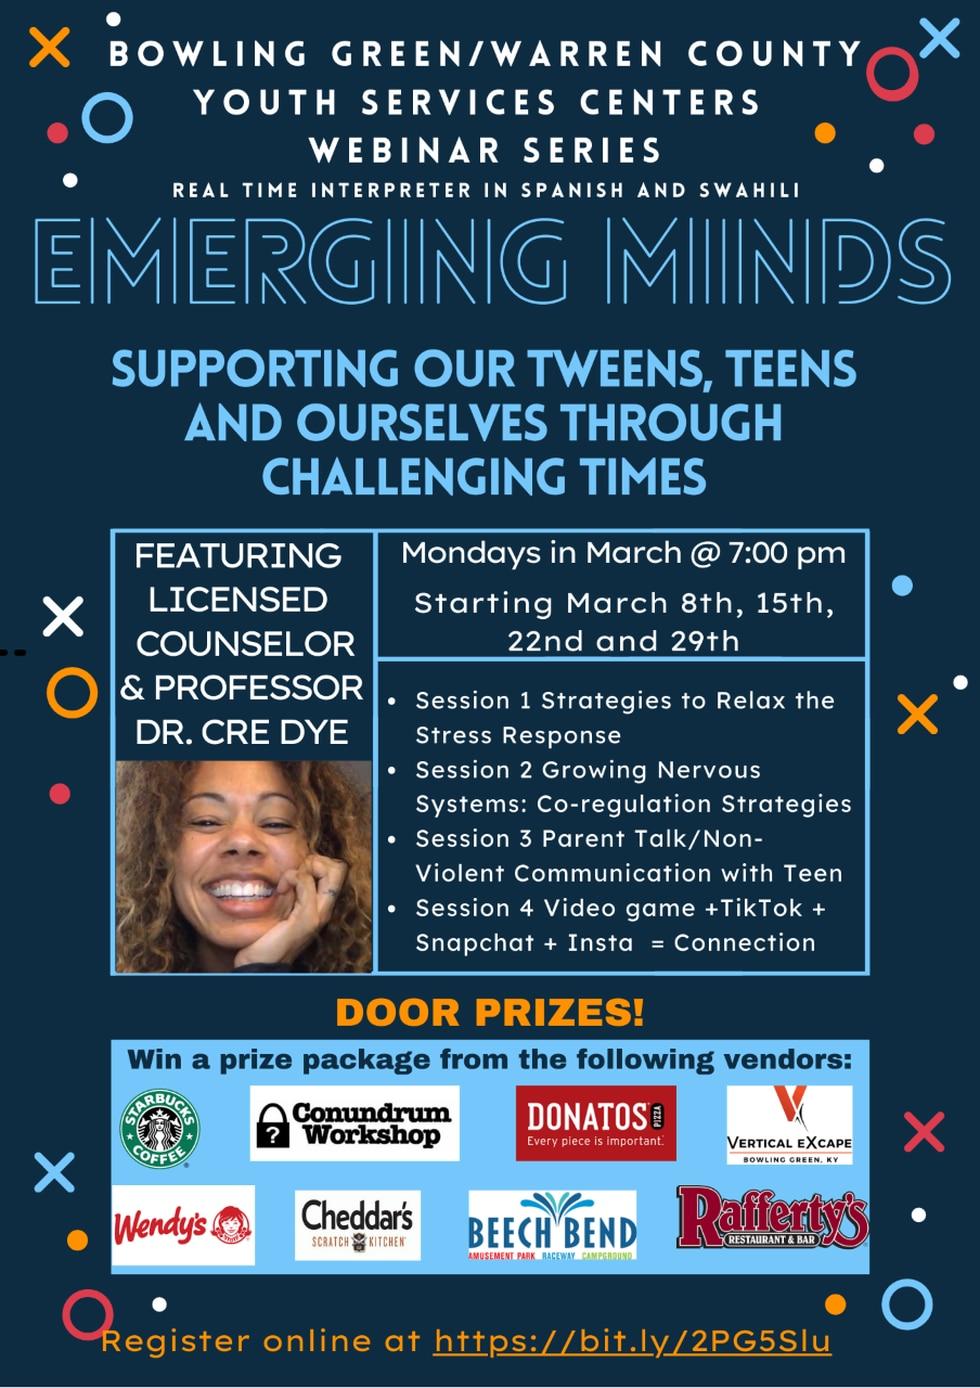 """Emerging Minds"" webinar helps tweens and teens with mental health issues."